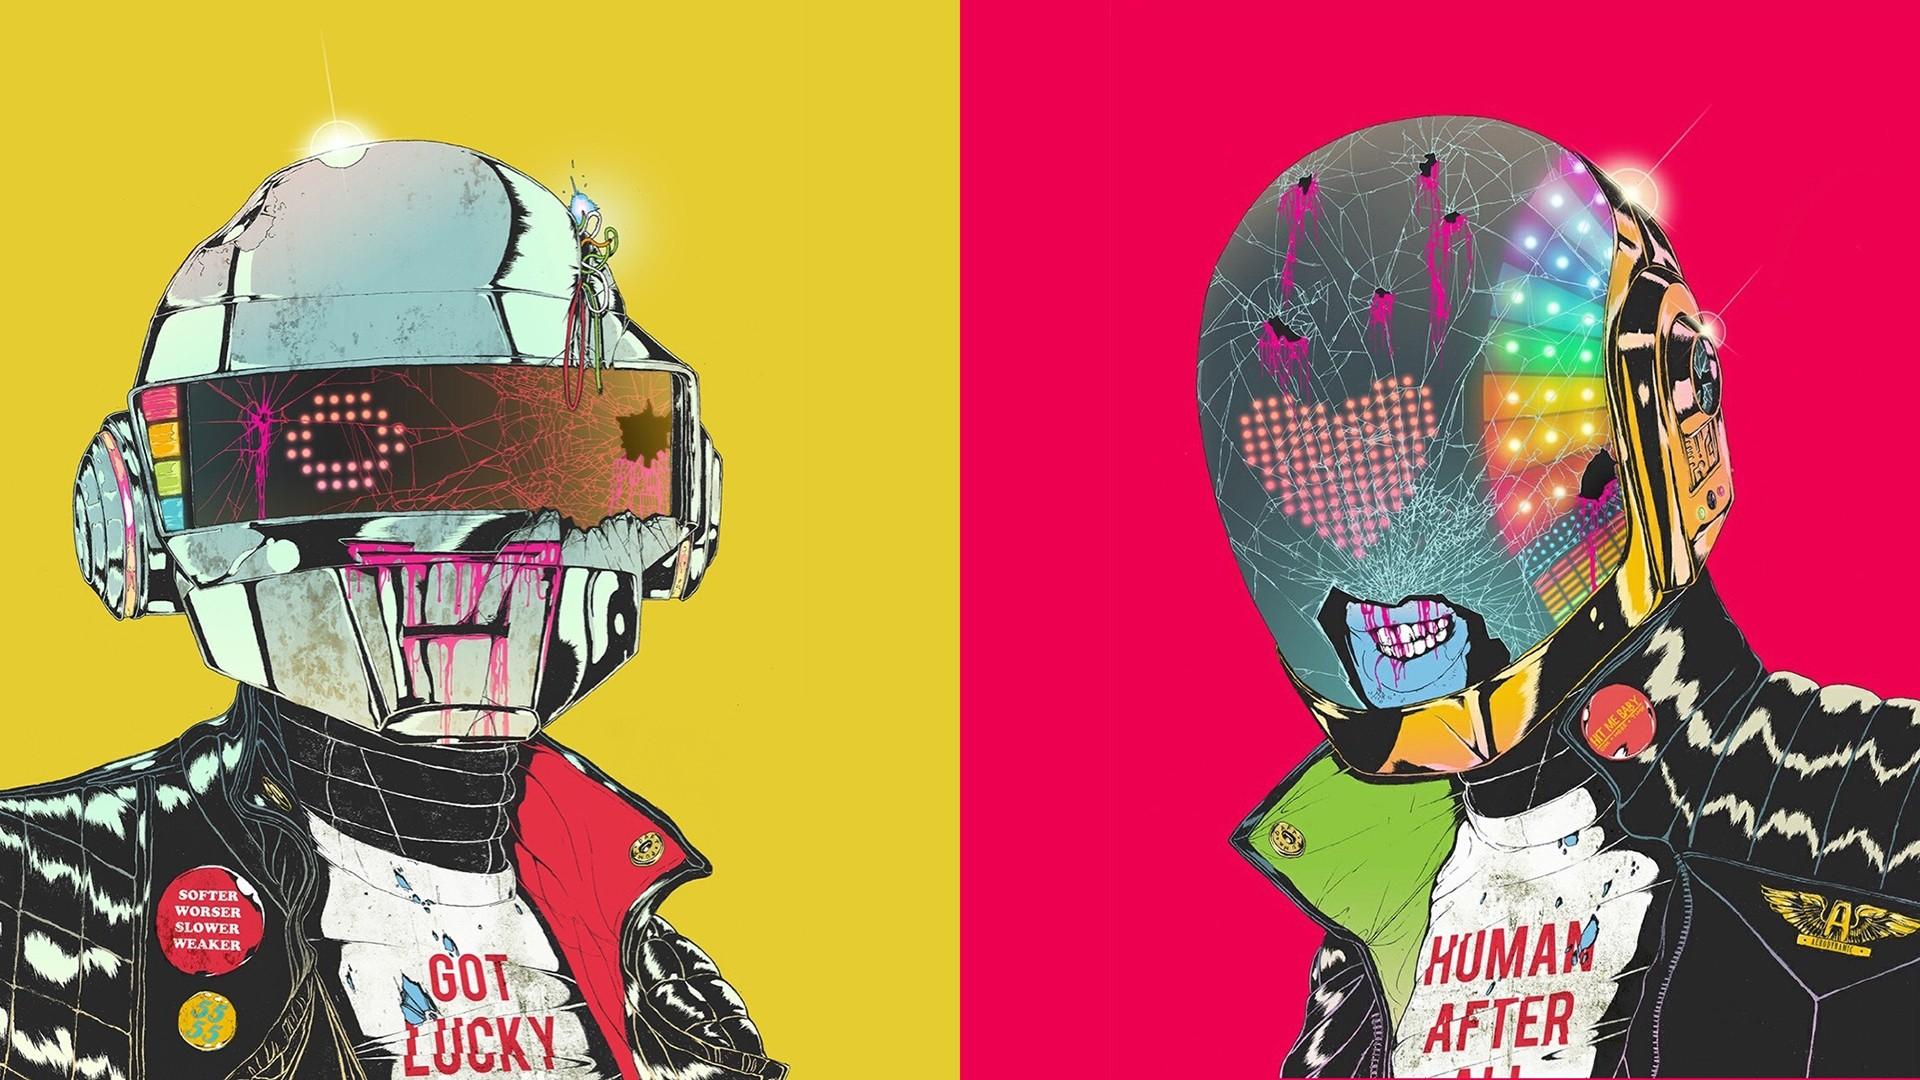 music, Daft Punk, cyborg - wallpaper #162992 (1920x1080px) on Wallls.com